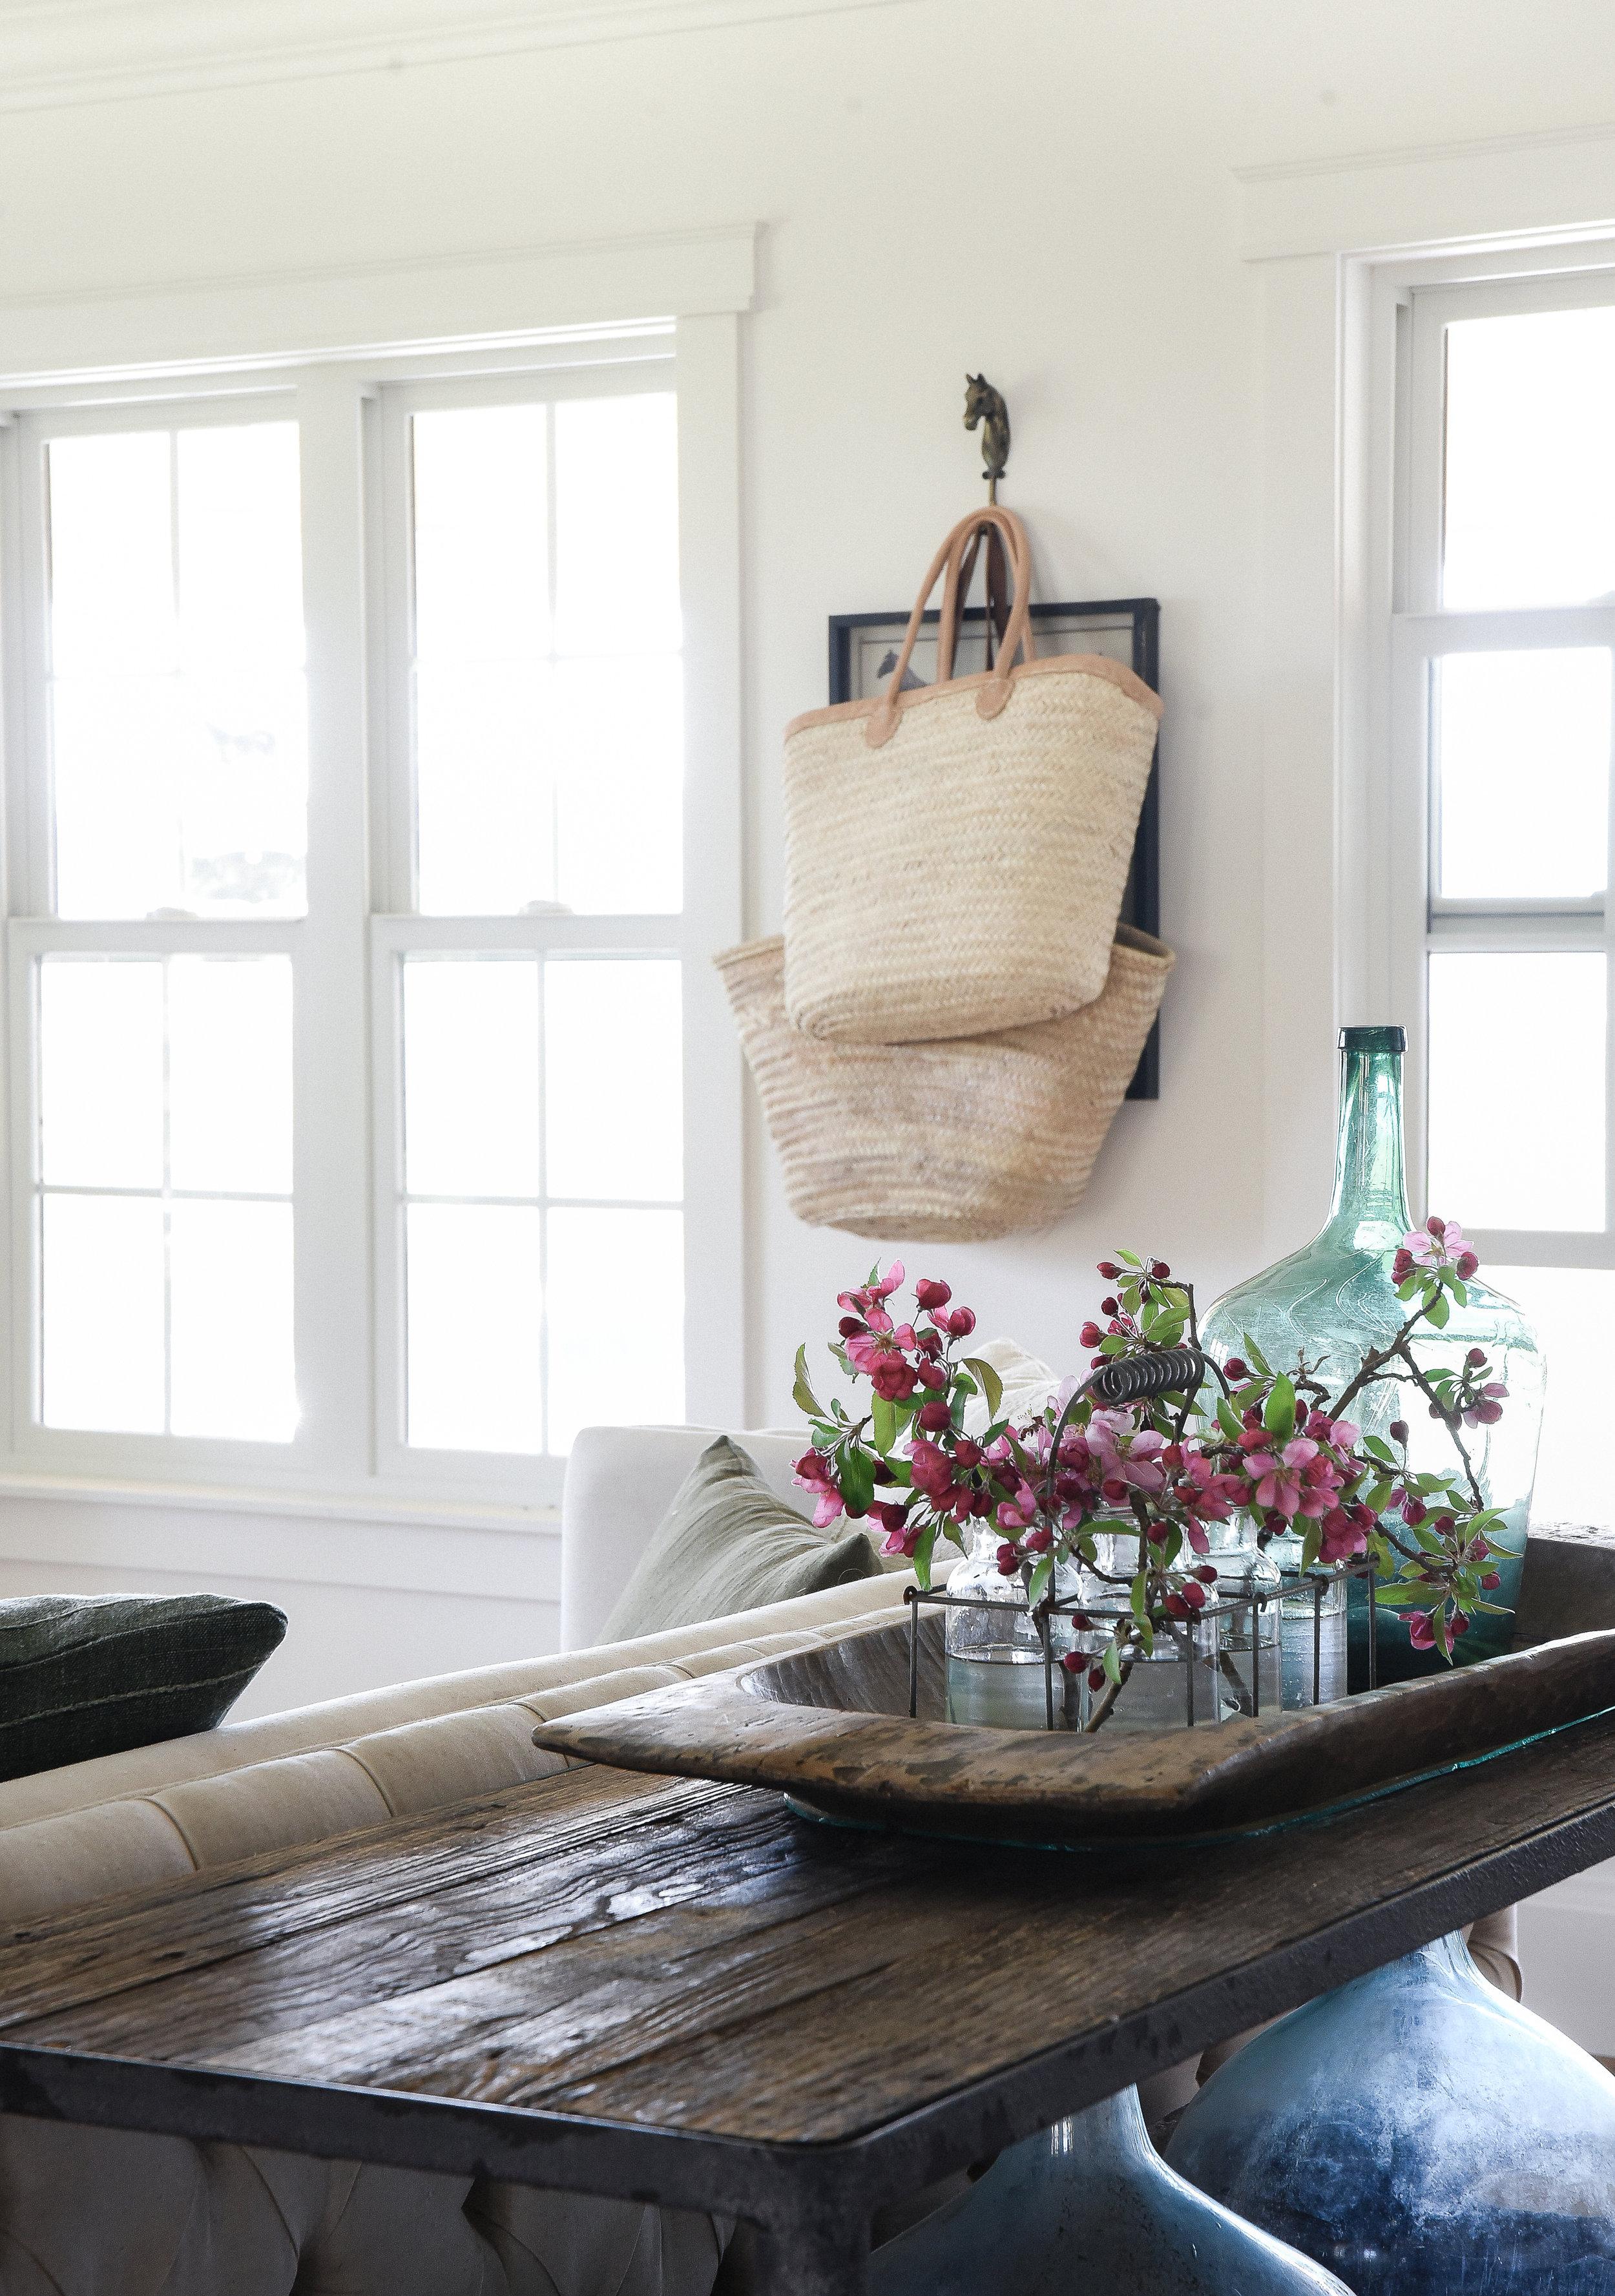 Beautiful Farmhouse Living Room With Market Baskets Hanging And Fresh  Flowers #summerdecoratign #springdecor #